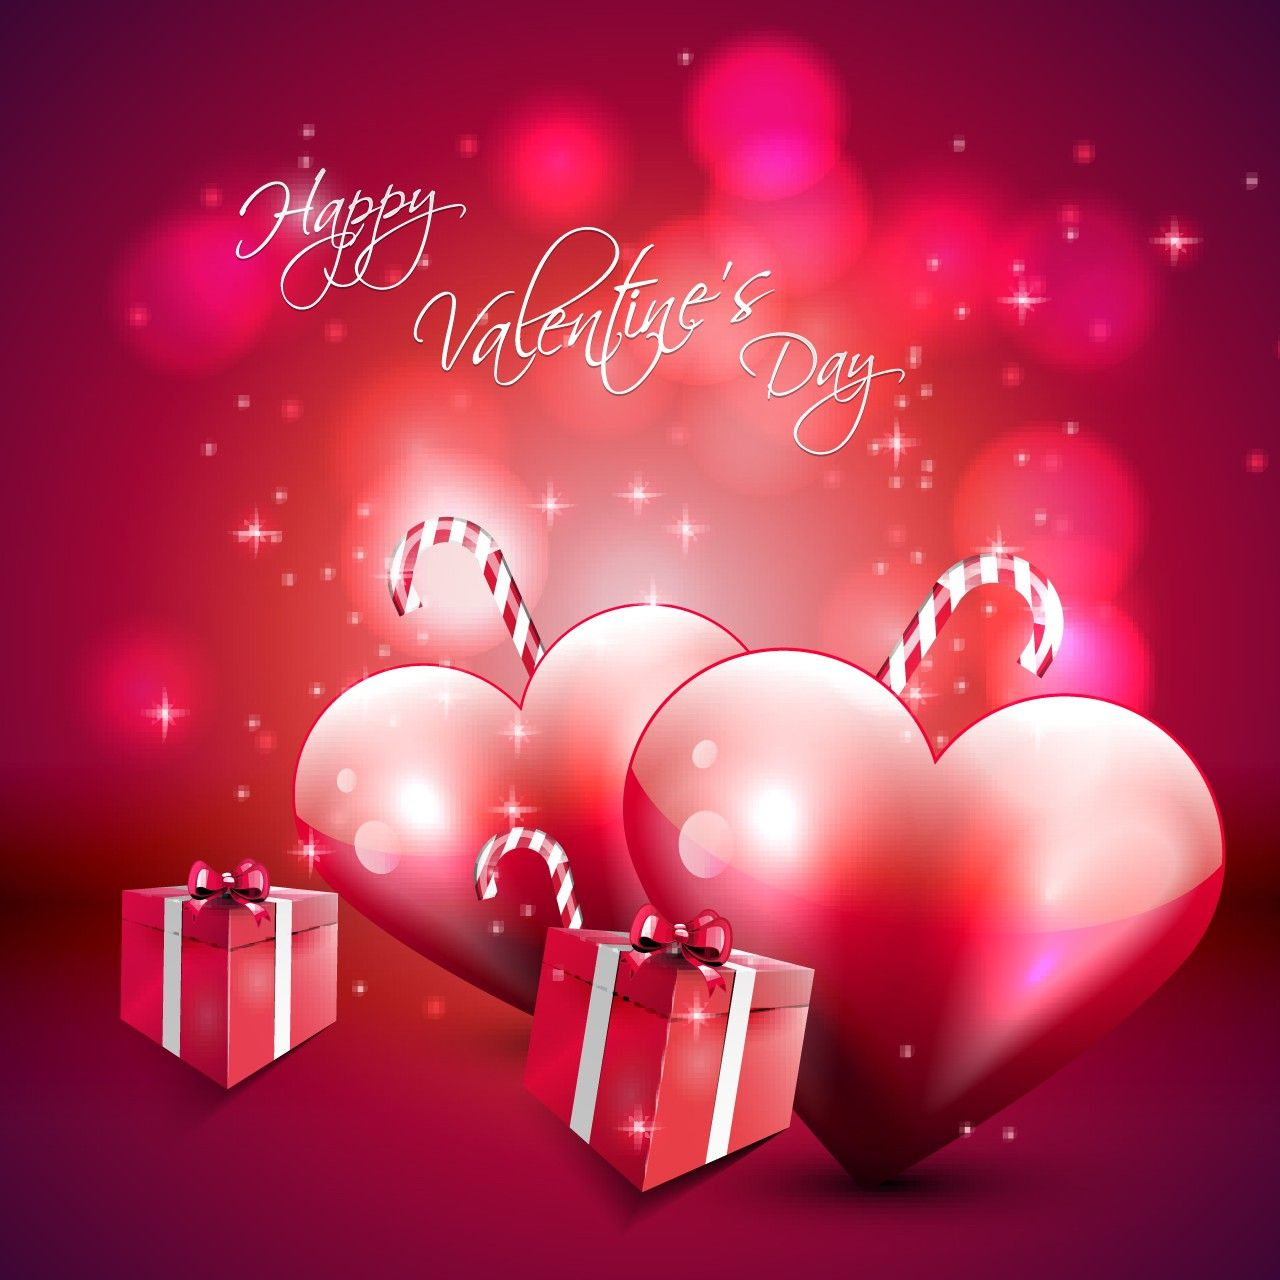 1280x1280 cute happy valentines day wallpaper beautiful valentine day